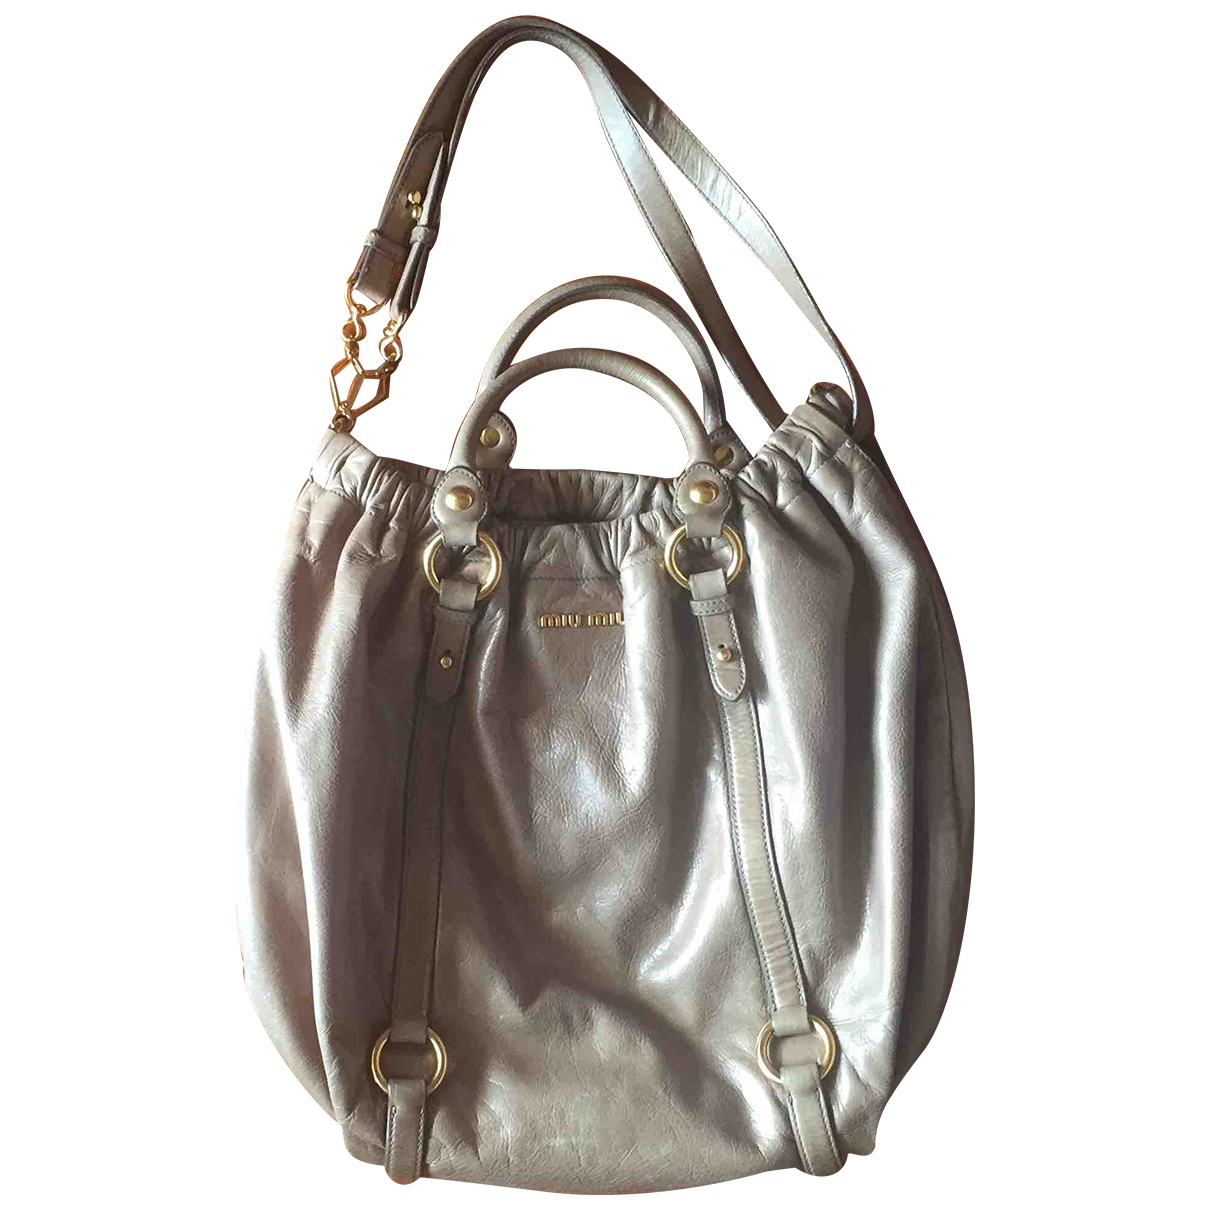 Miu Miu - Sac a main Bow bag pour femme en cuir - gris